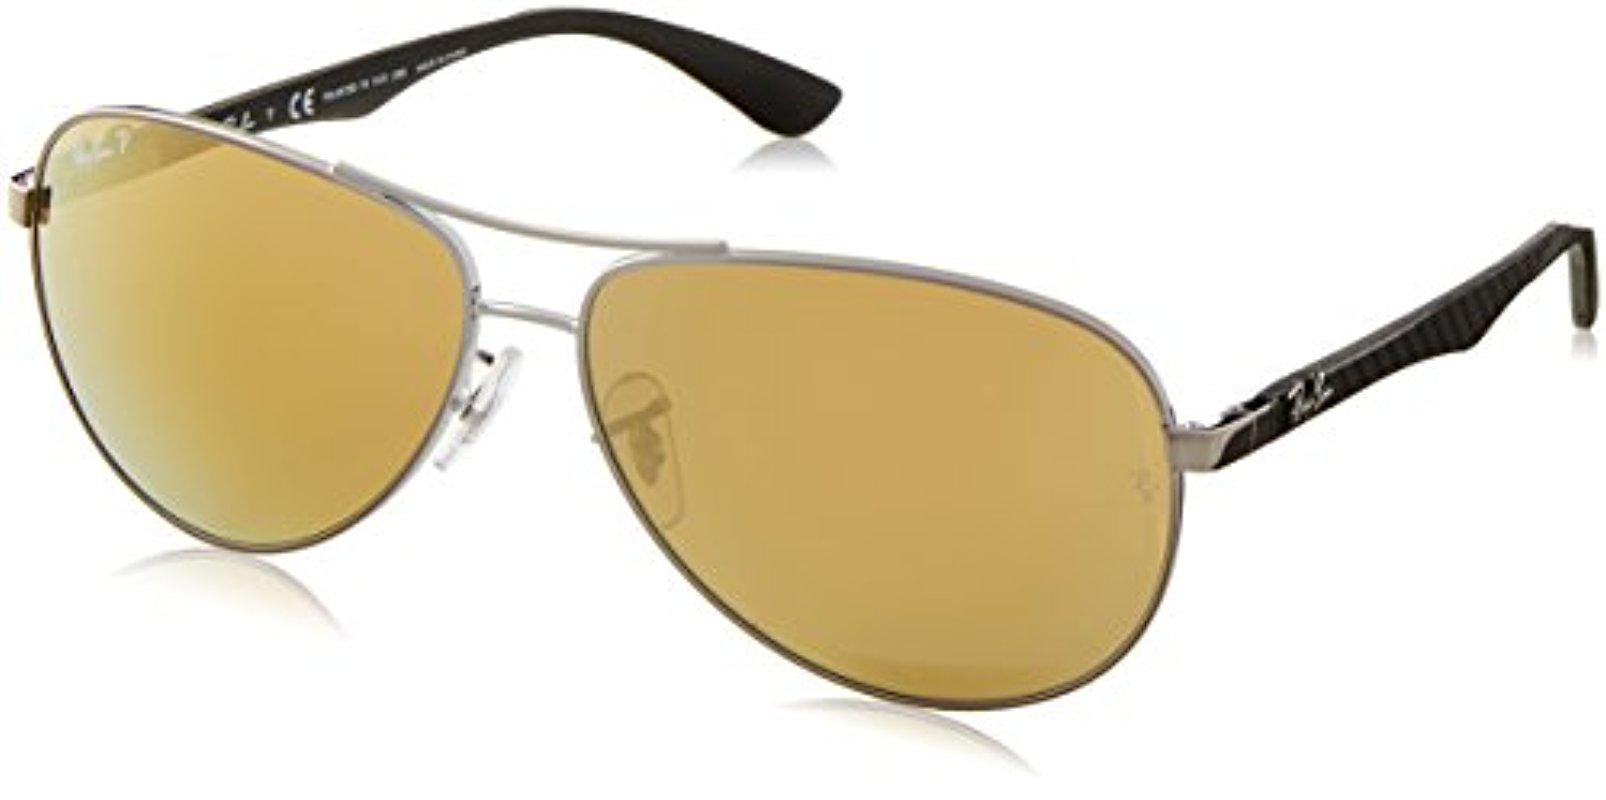 8733fabd6cf Lyst - Ray-Ban Carbon Fibre - Shiny Gunmetal Frame Brown Mirror Gold ...